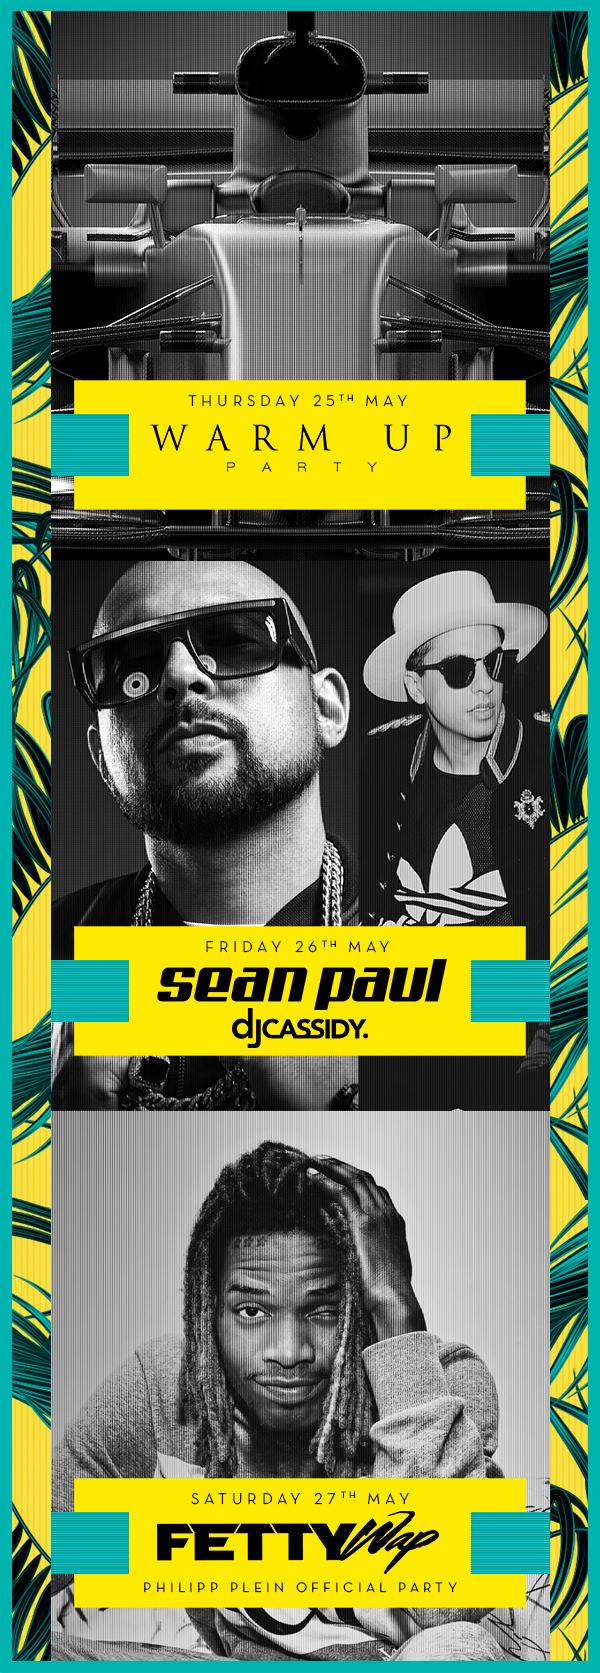 Warm Up Party 25th May - Sean Paul & DjCassidy 26th May - Fetty Wap 27th May